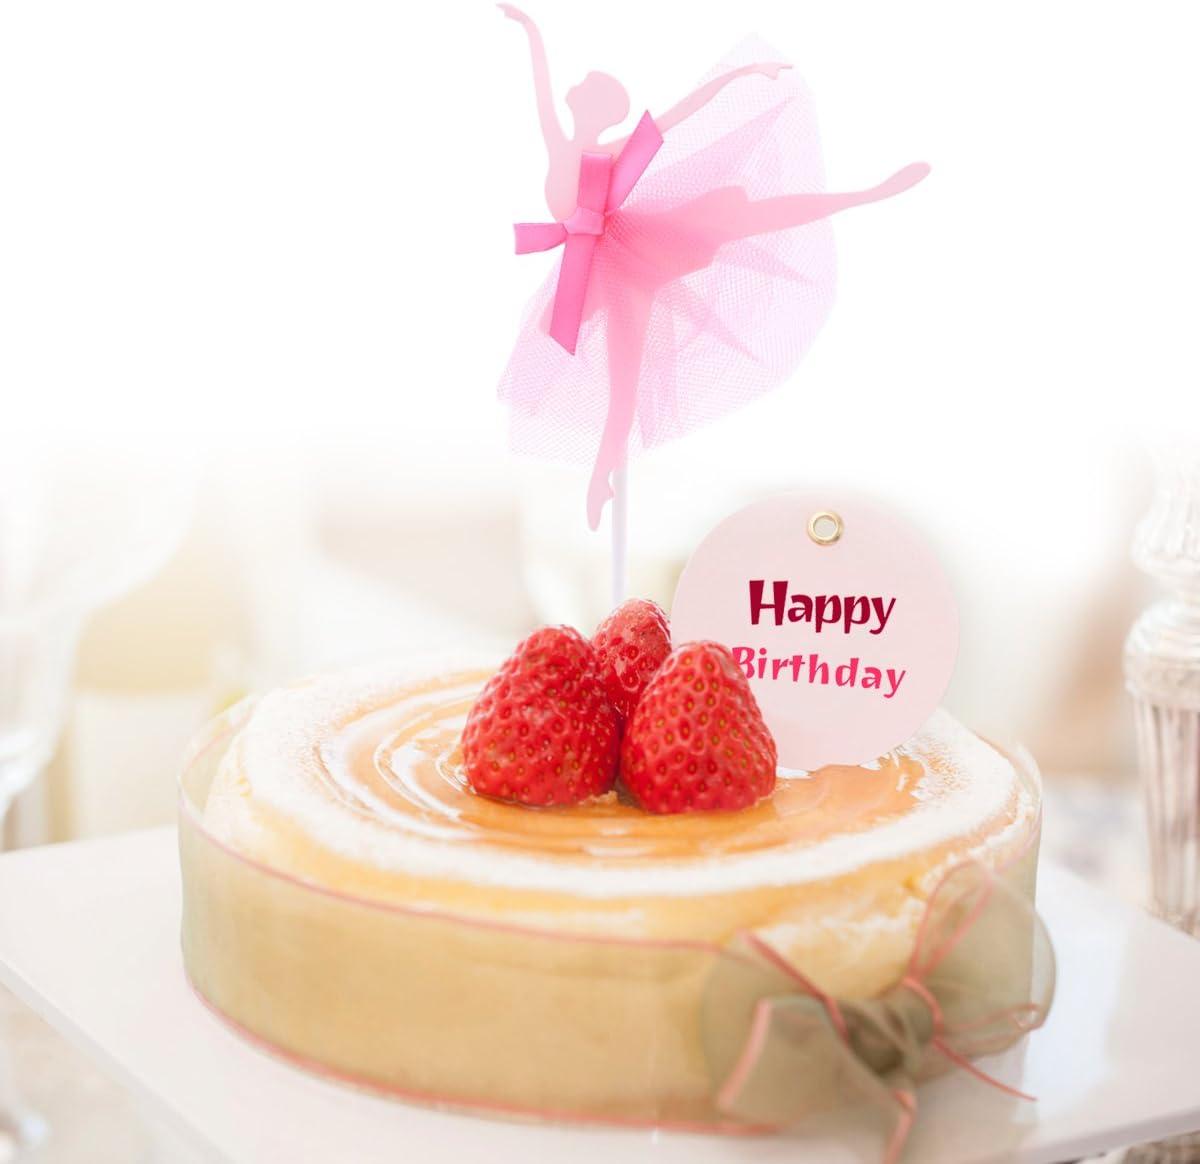 Red BESTOYARD 5pcs Ballerina Girls Cupcake Picks Birthday Cake Topper Cocktail Decoration Sticks Wedding Birthday Party Supplies